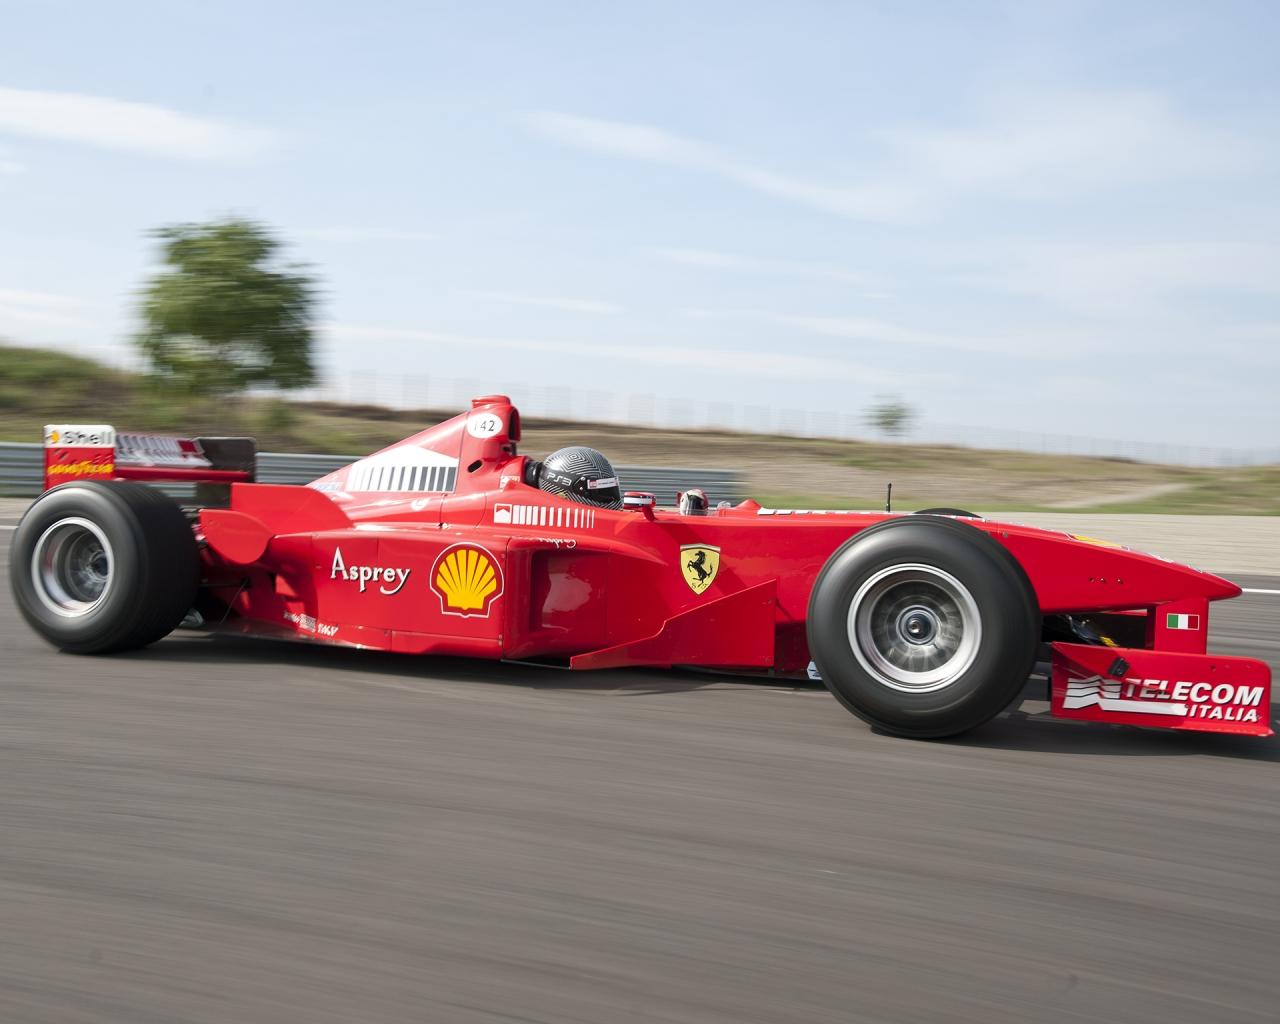 Ferrari F300 Formula 1 - 1280x1024